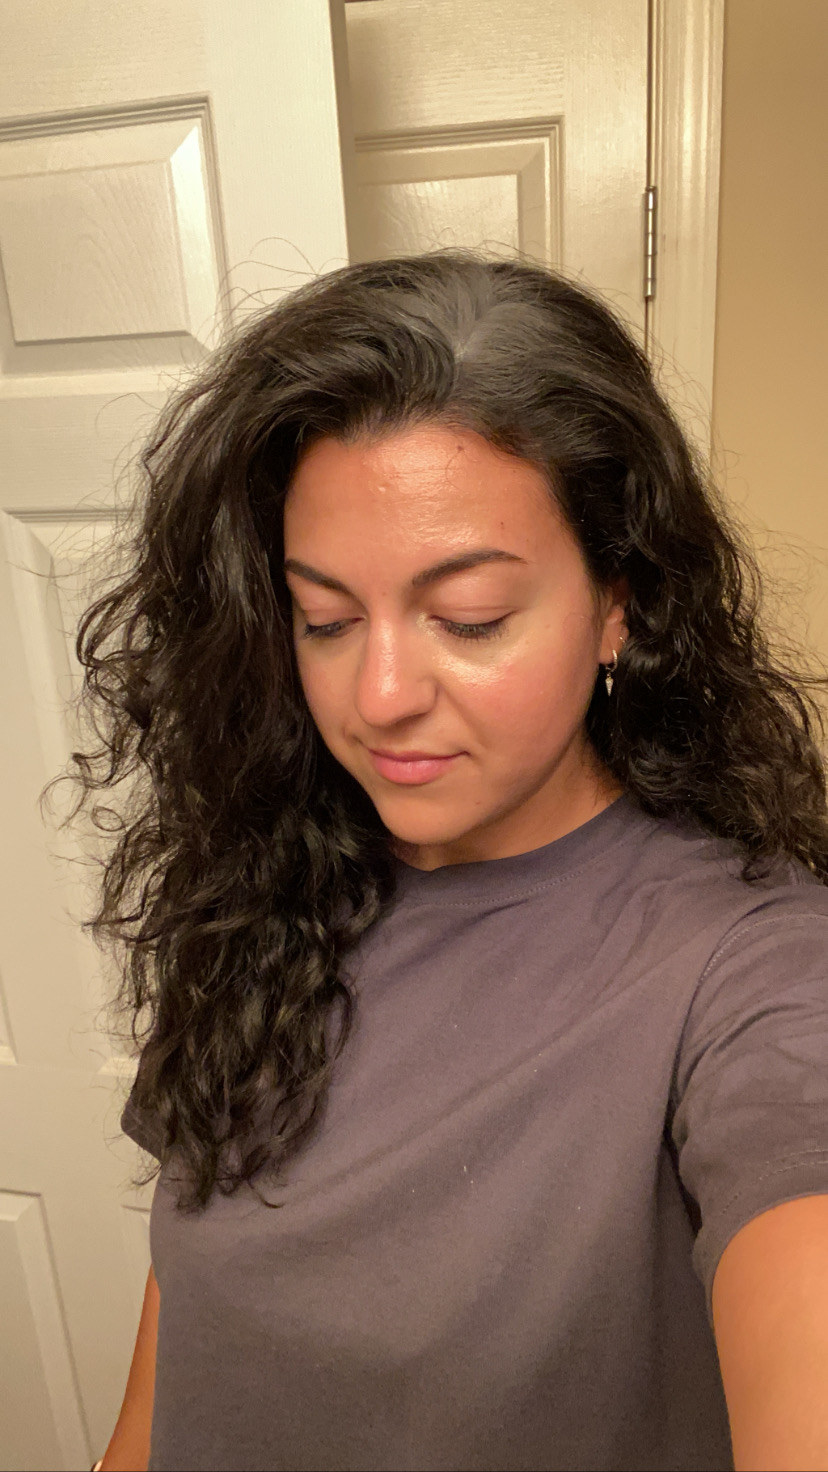 The author applying dry shampoo